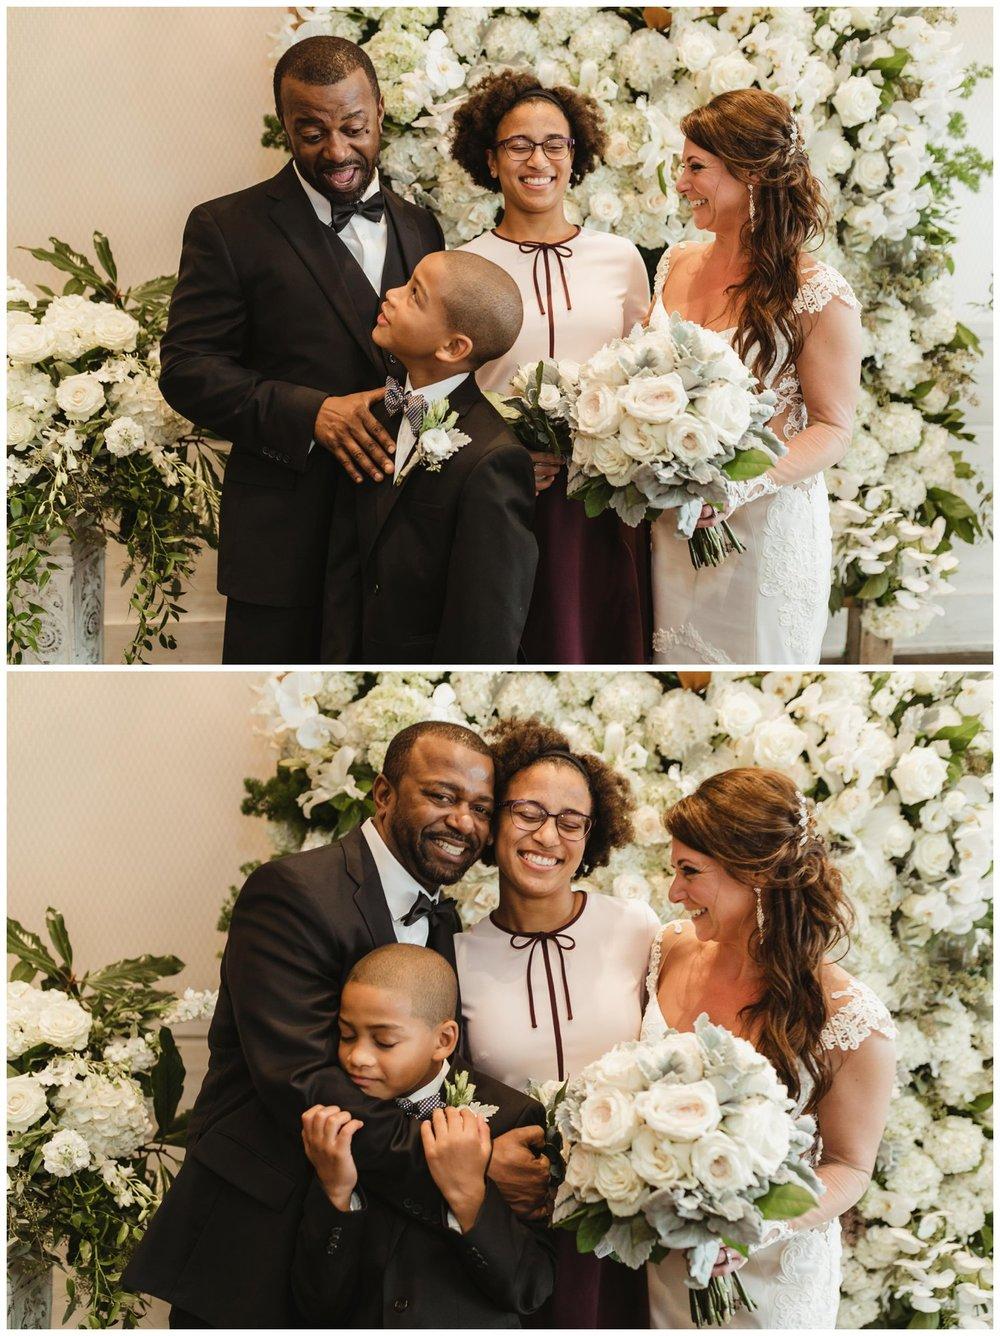 JillandLennon_TheReeds_ShelterHaven_StoneHarbor_NJ_NewJersey__SouthJersey_Wedding_Photographer_MagdalenaStudios_0312.jpg